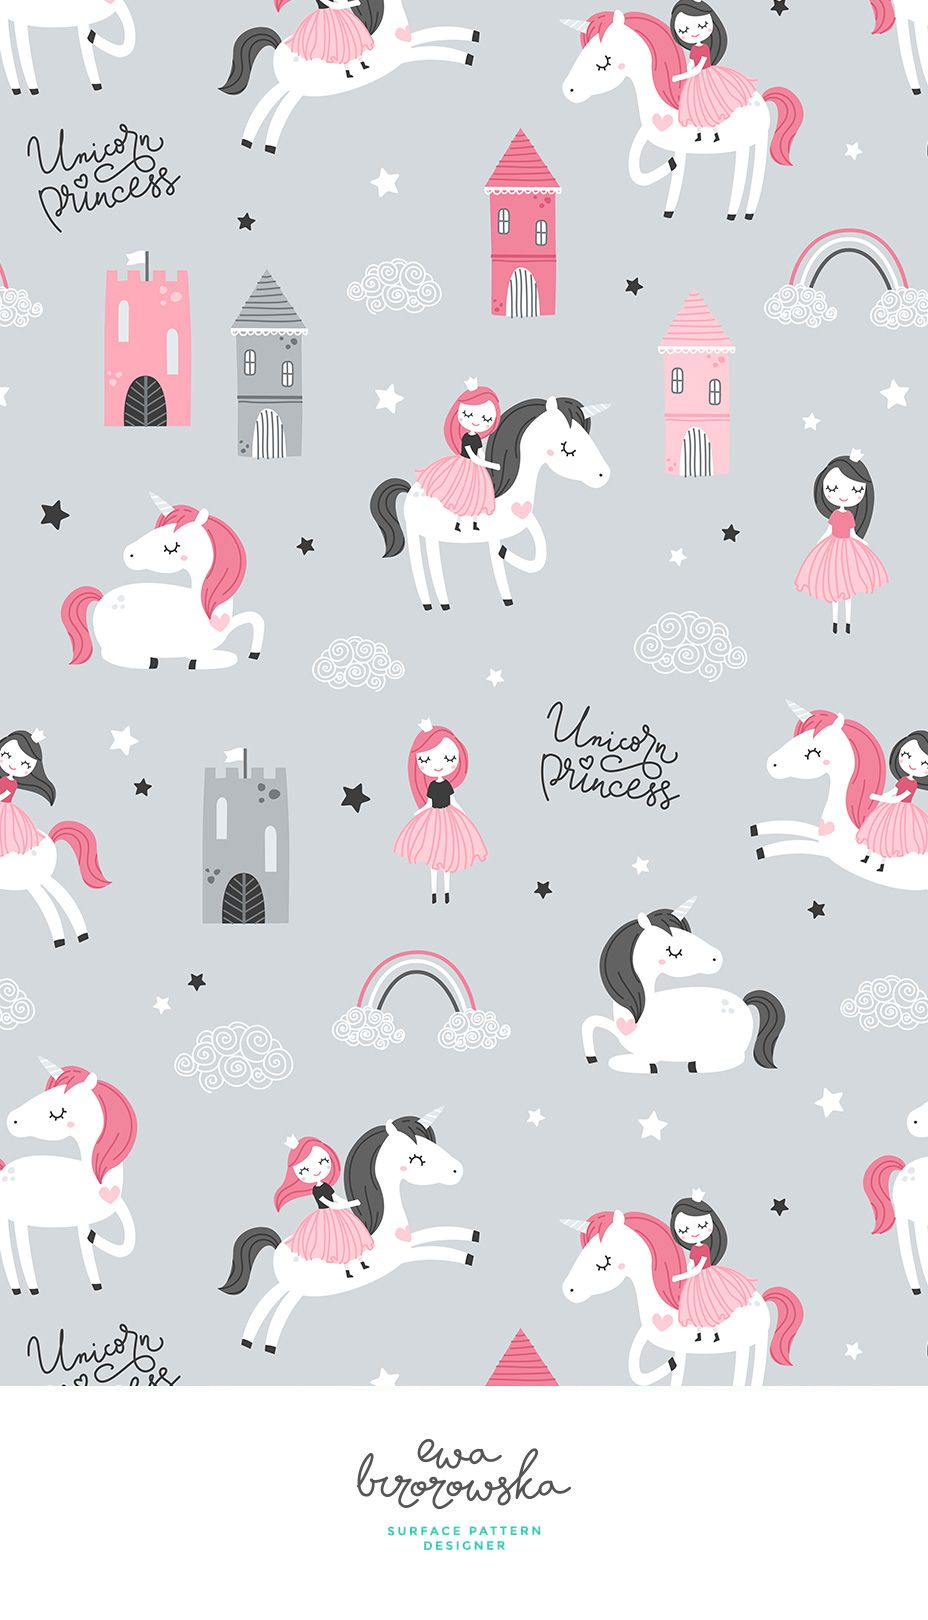 Colorful Fabrics Digitally Printed By Spoonflower Unicorn Princess Grey Unicorn Wallpaper Cute Wallpaper Design Pattern Unicorn Wallpaper